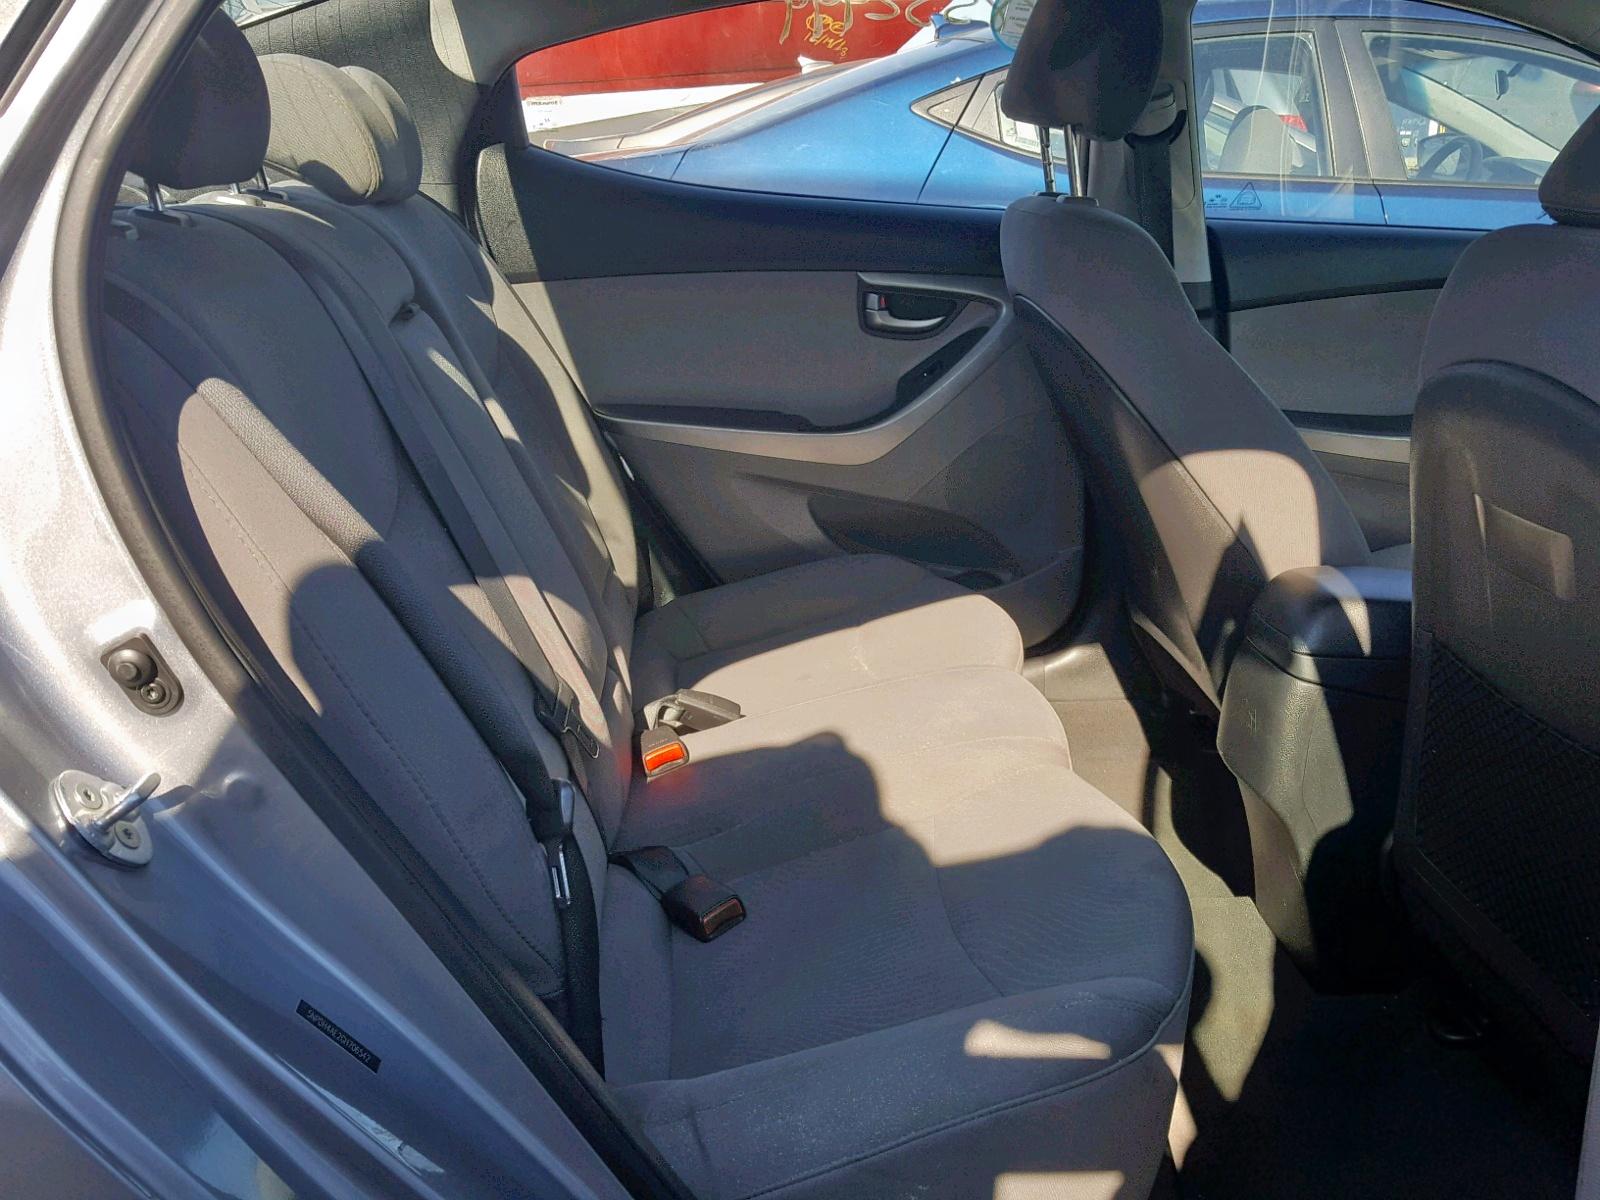 2016 Hyundai Elantra Se 1.8L detail view